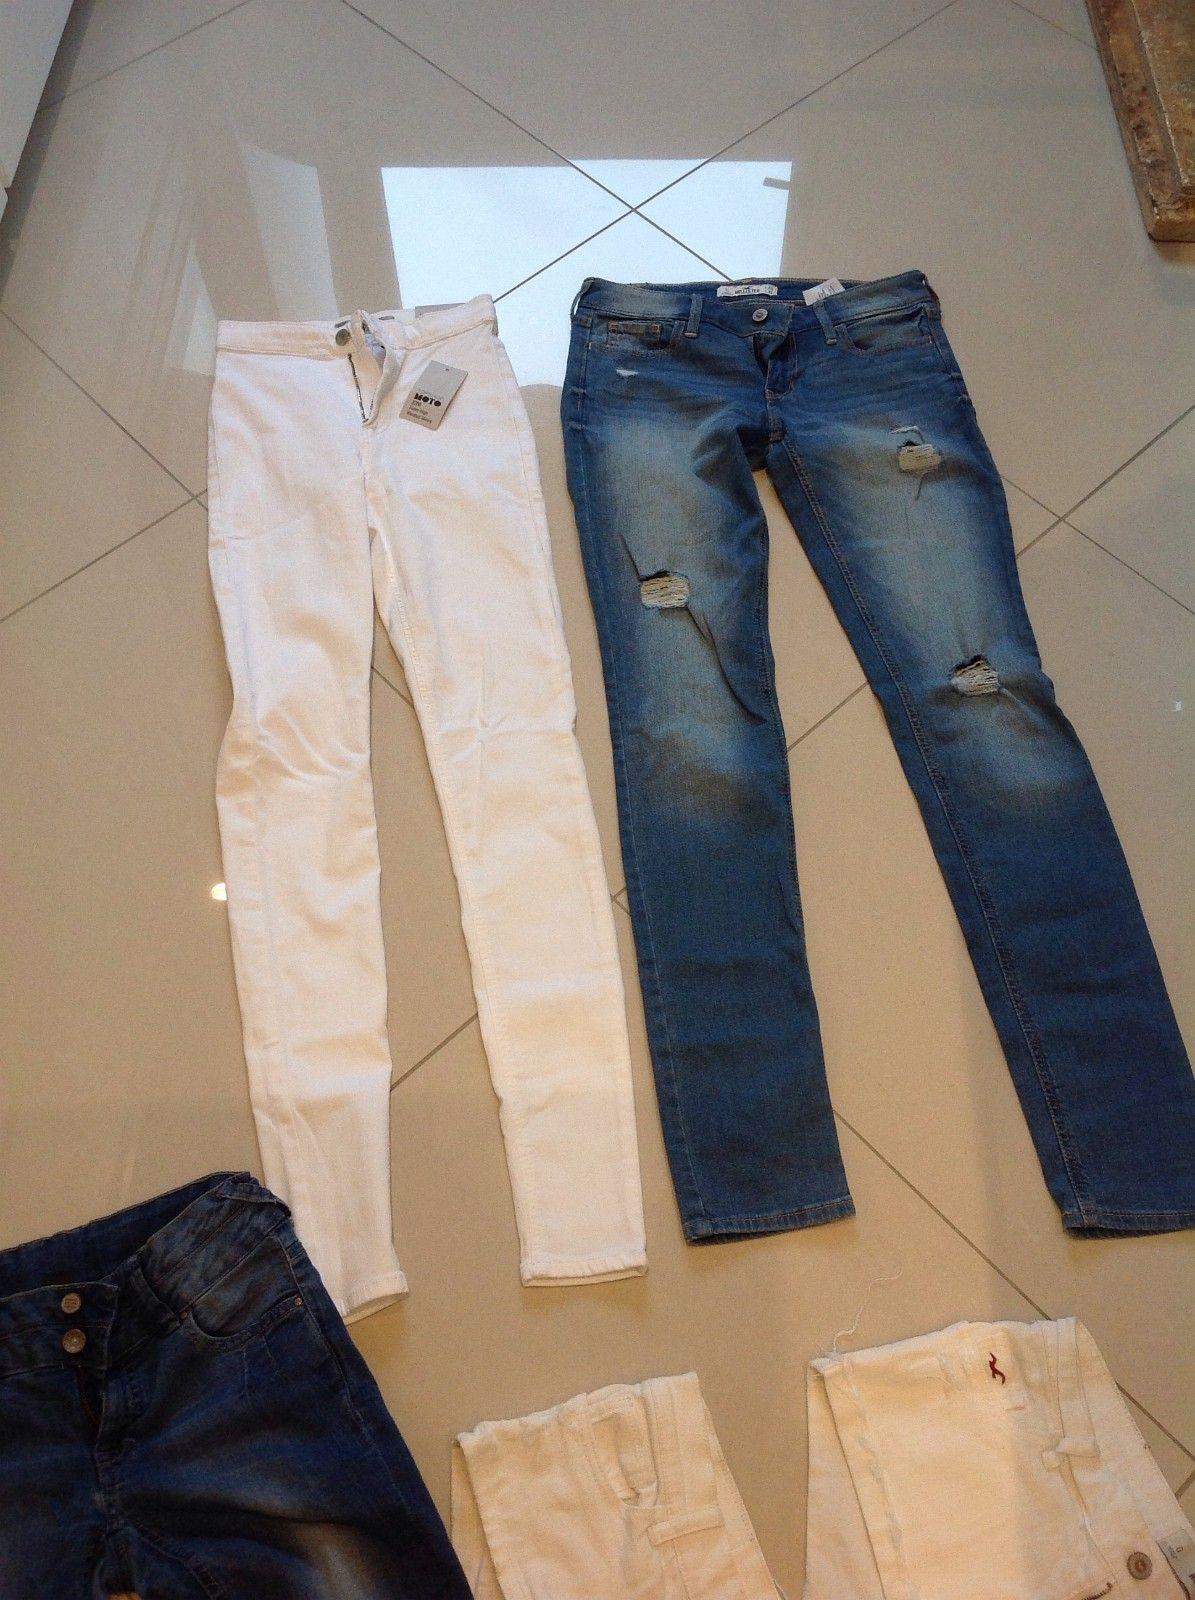 Jeans - Oslo  - Jeans fra top shop helt ny i vitt Str W26 L 34 pris 280kr holister jeans W 25L33 lite brukt 150kr - Oslo